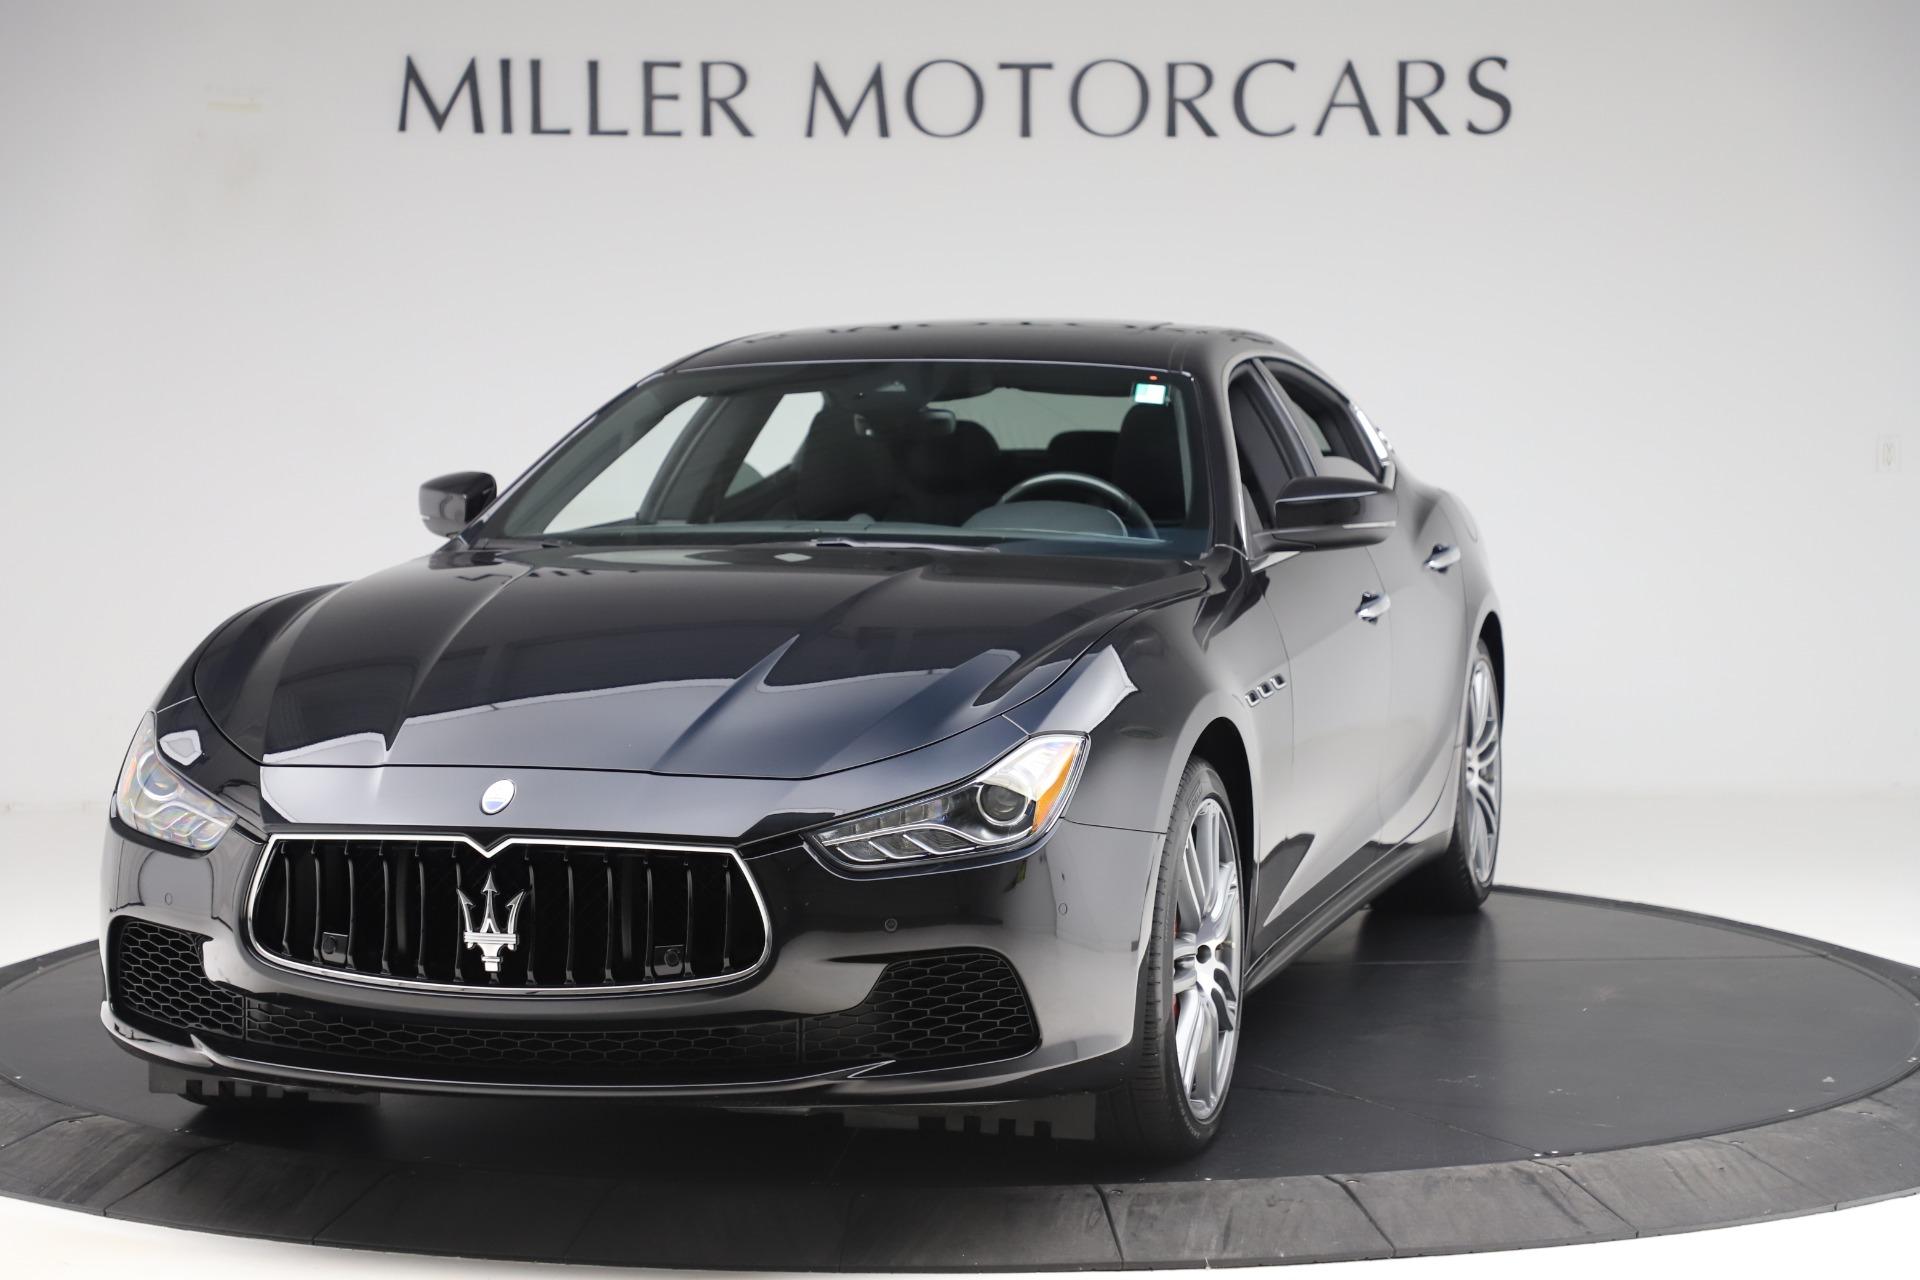 Used 2017 Maserati Ghibli S Q4 for sale Sold at Alfa Romeo of Greenwich in Greenwich CT 06830 1